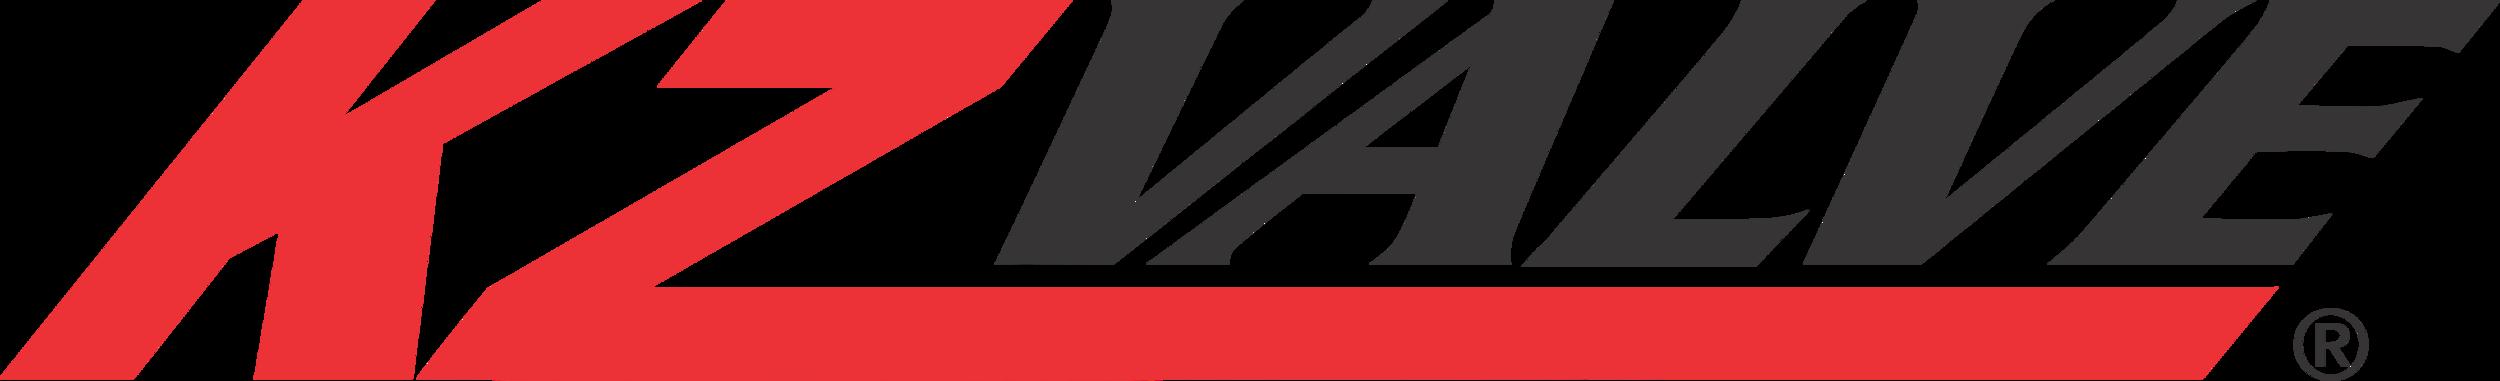 KZ Valves.png